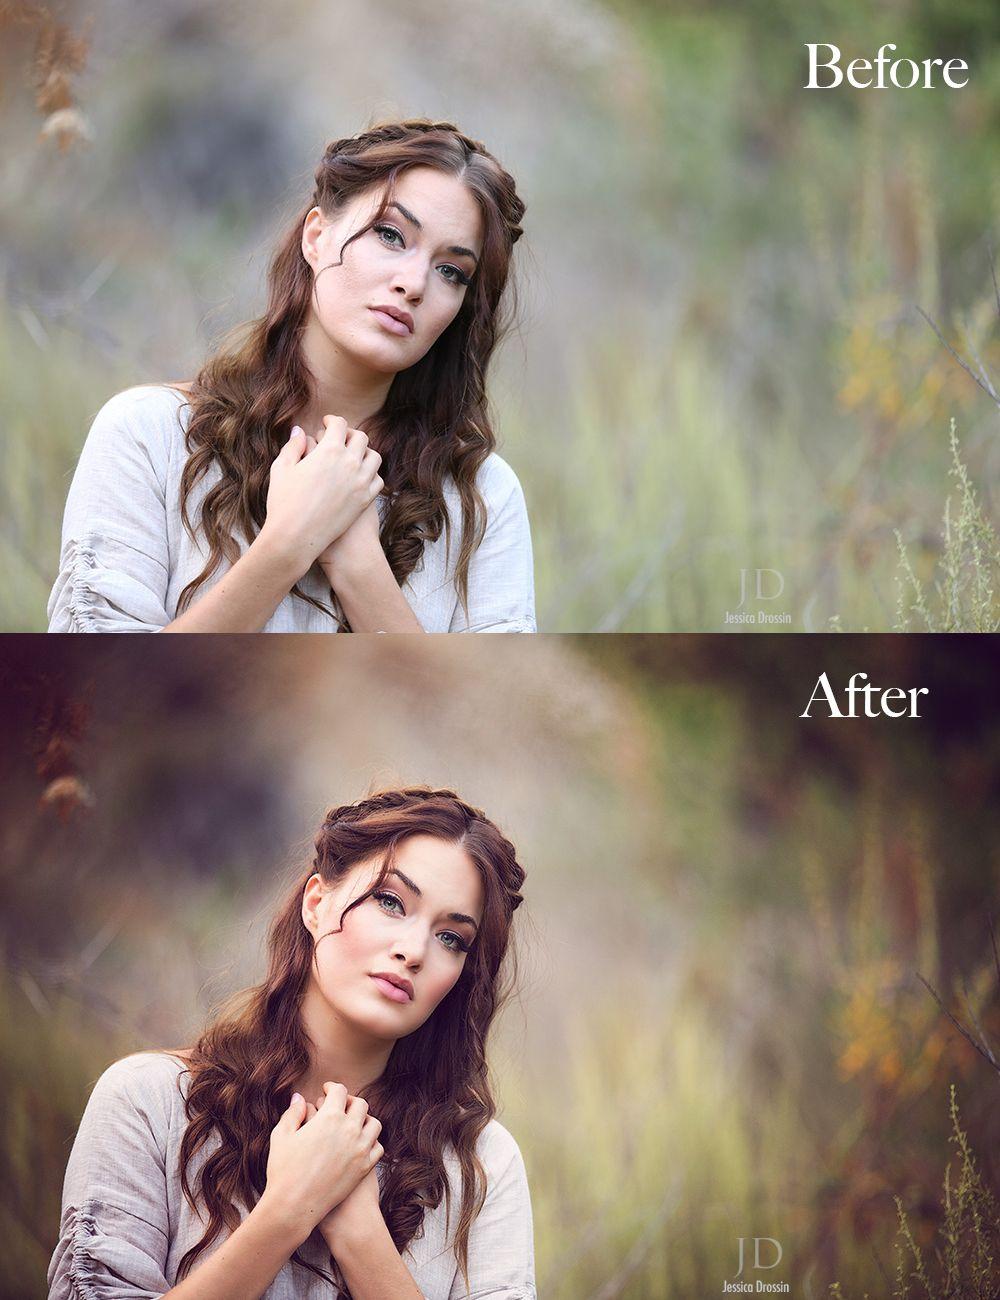 Portrait photography editing